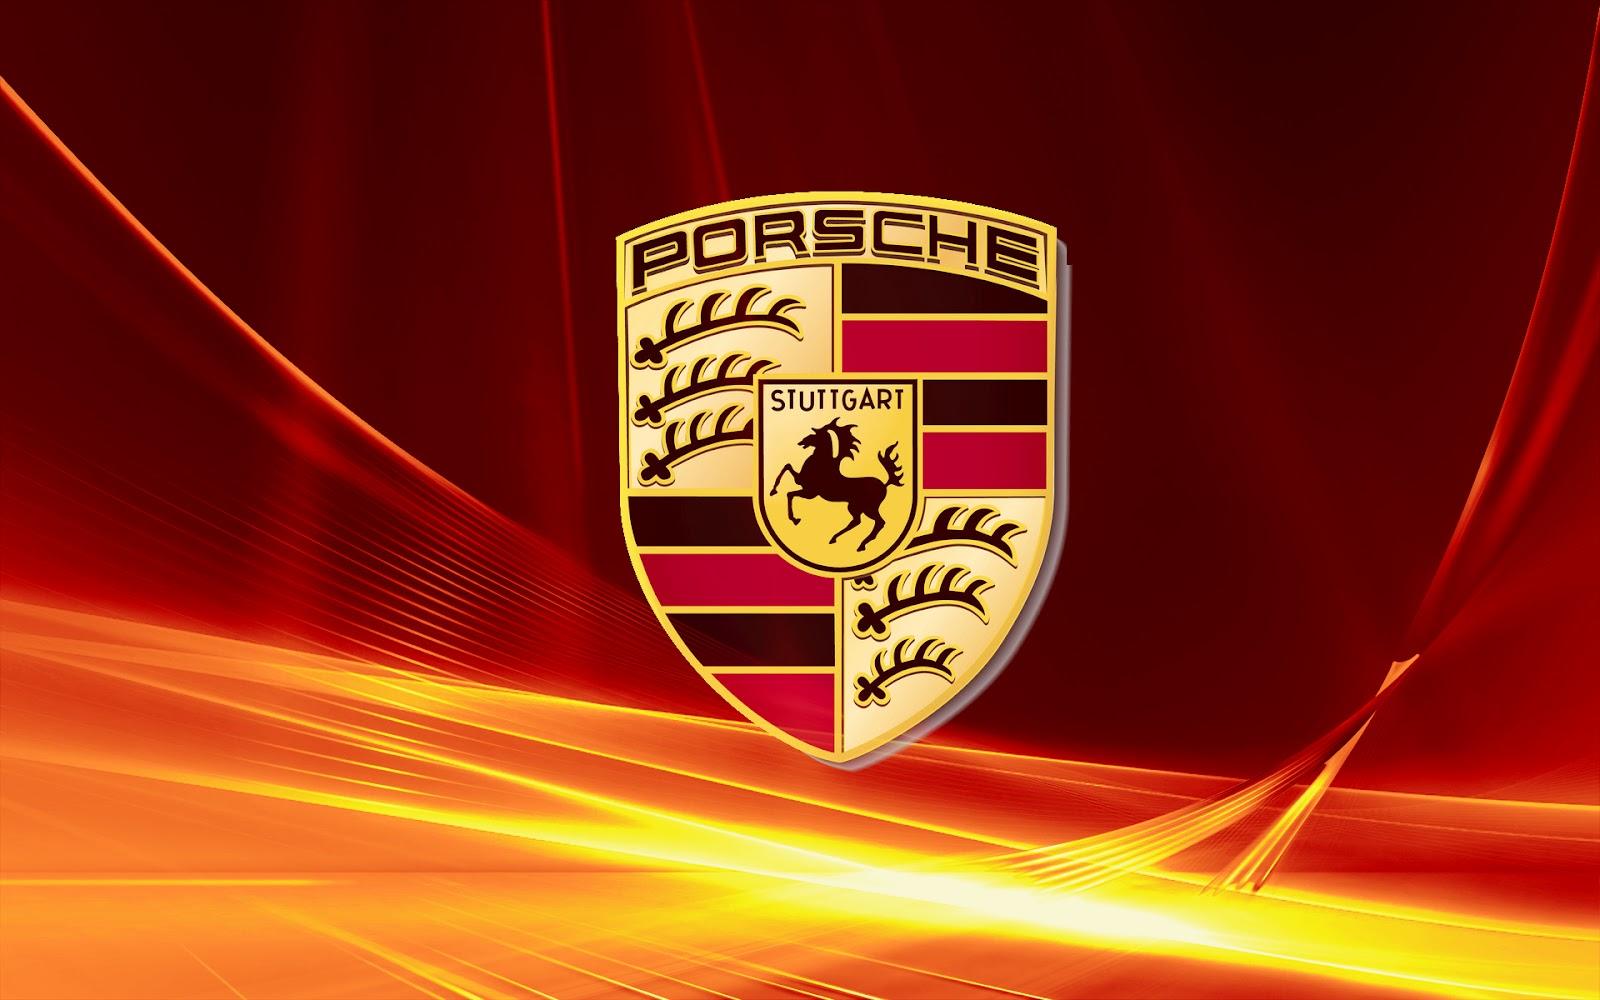 Porsche logo wallpaper wallpapersafari - Car logo wallpapers ...